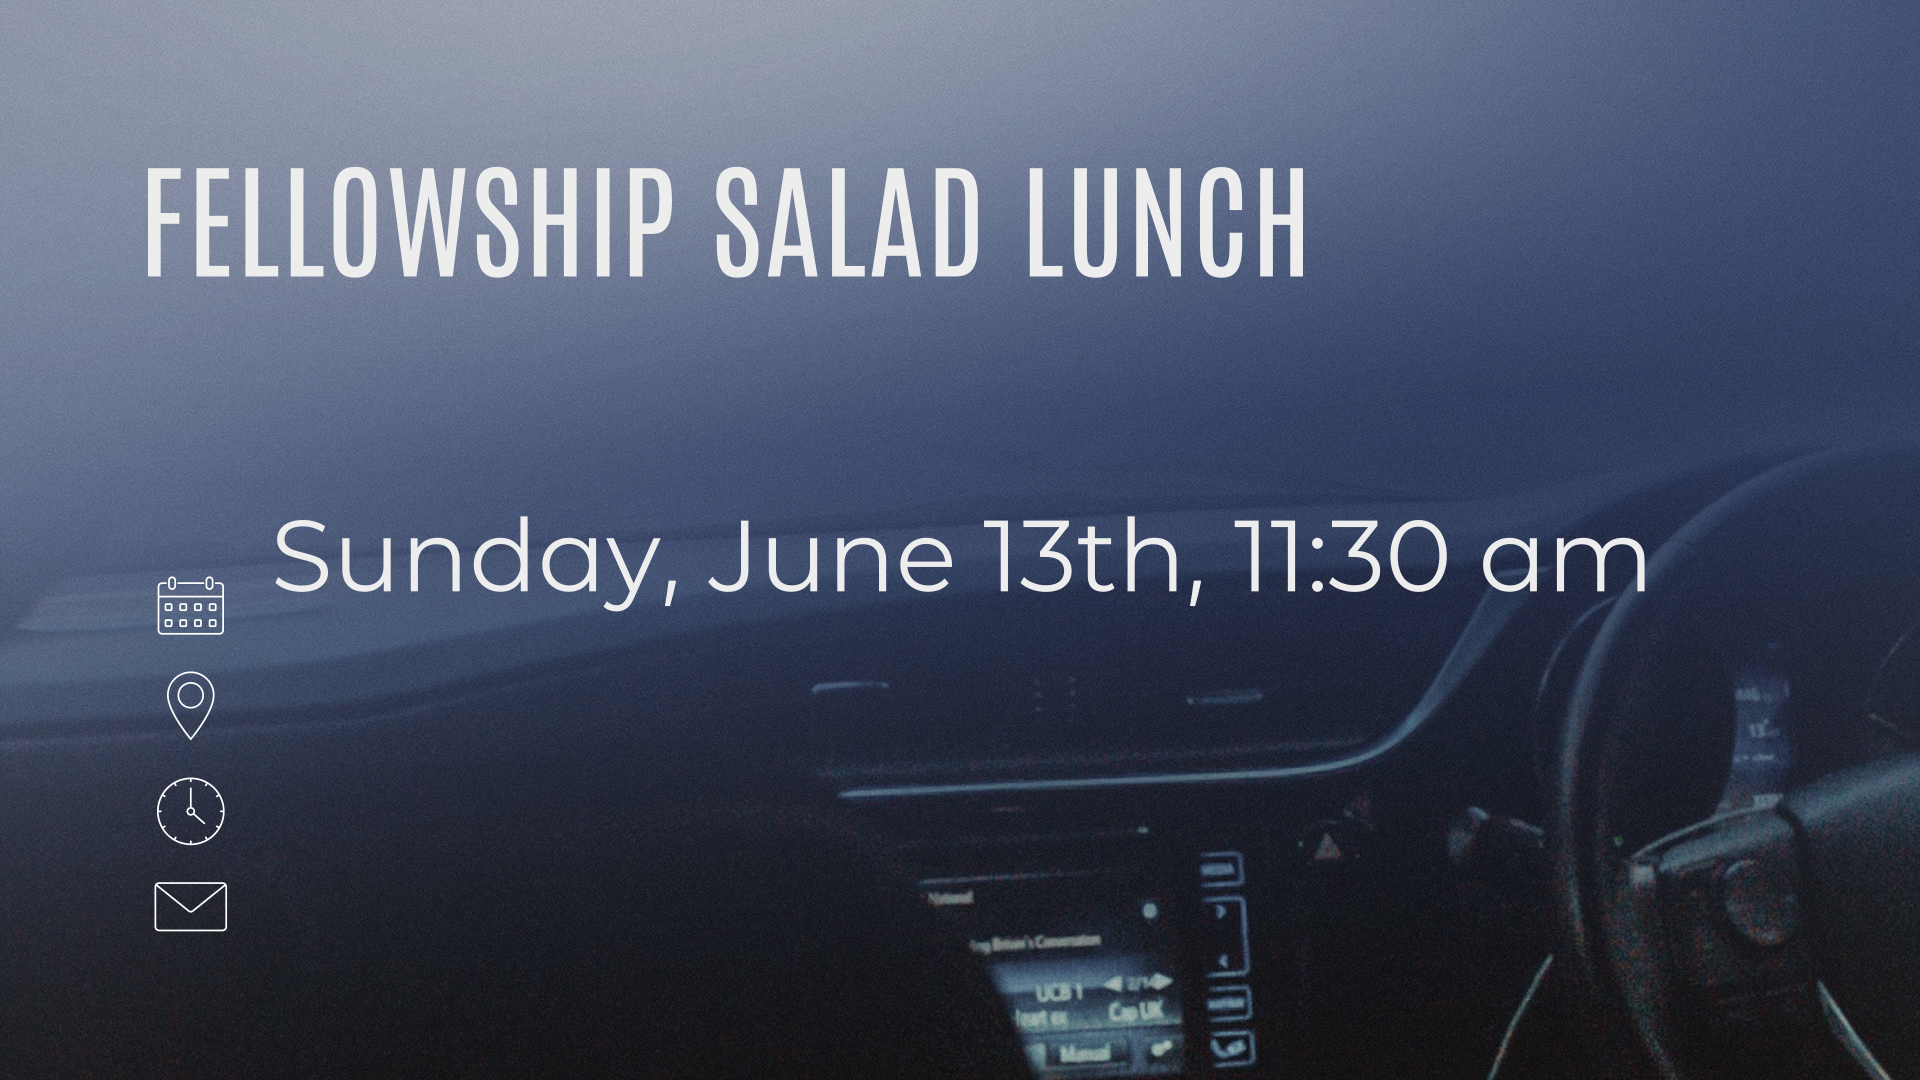 Fellowship Salad Lunch